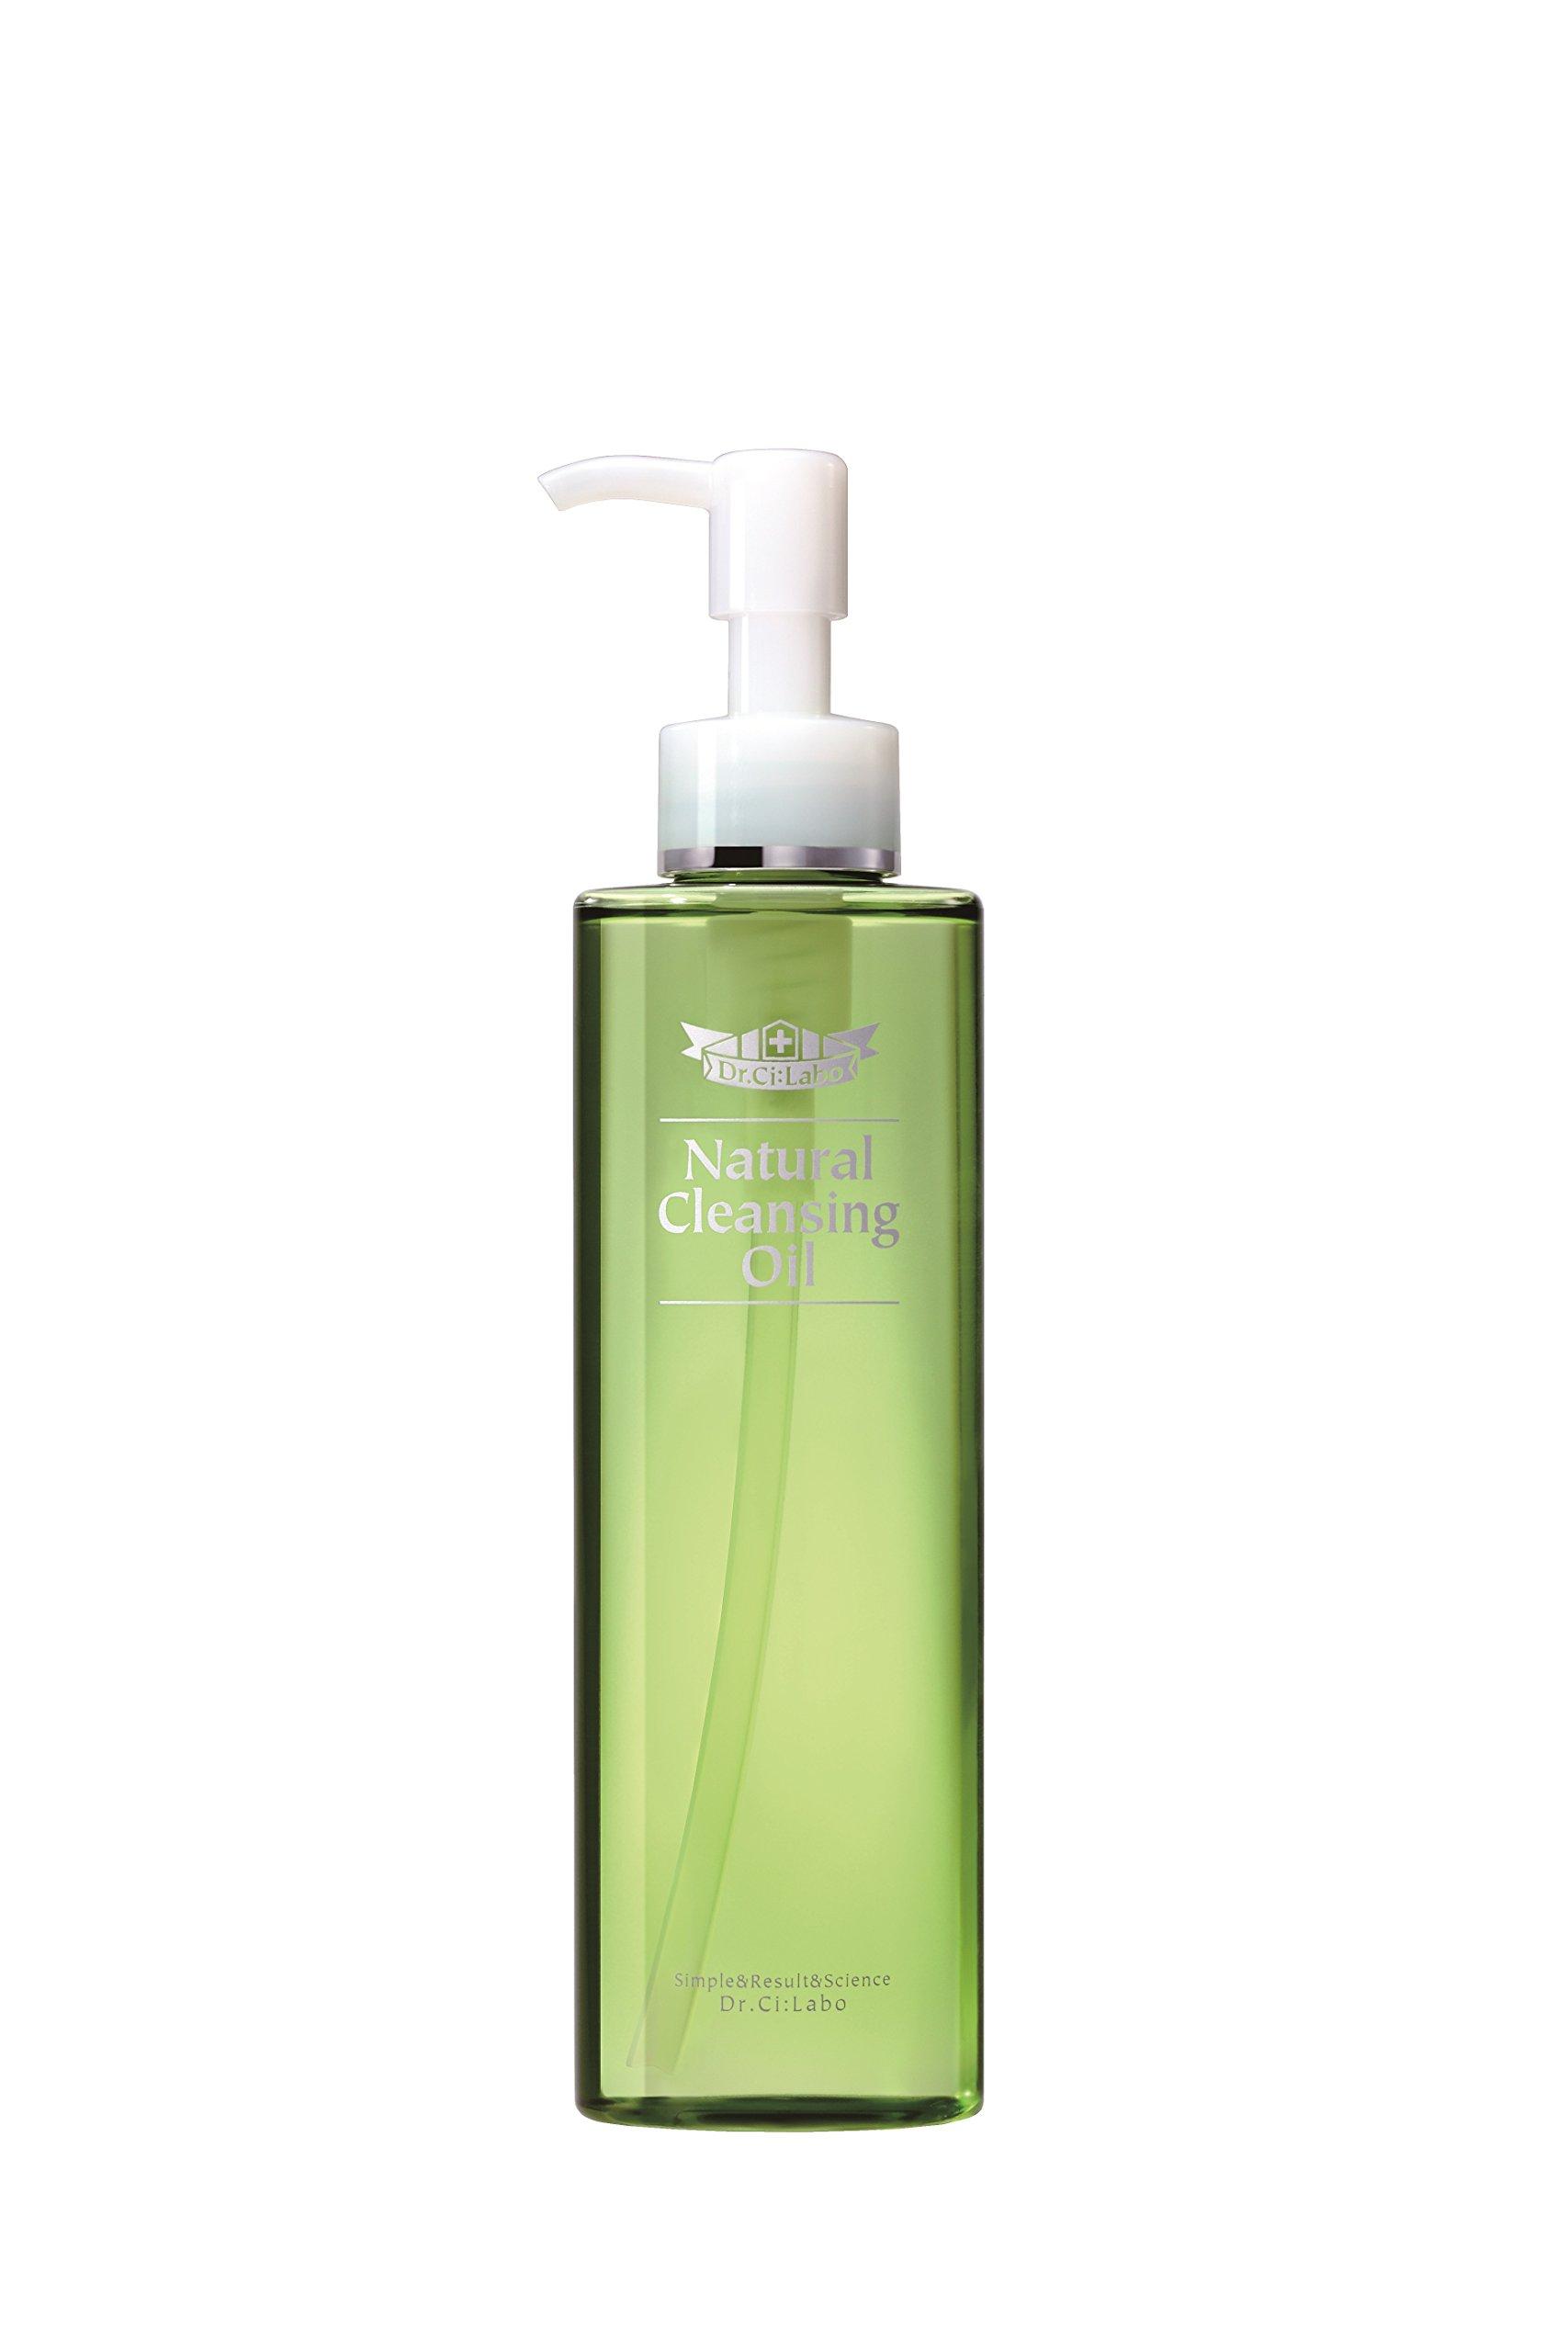 Dr. Ci:Labo Natural Cleansing Oil 5.1oz, 150ml